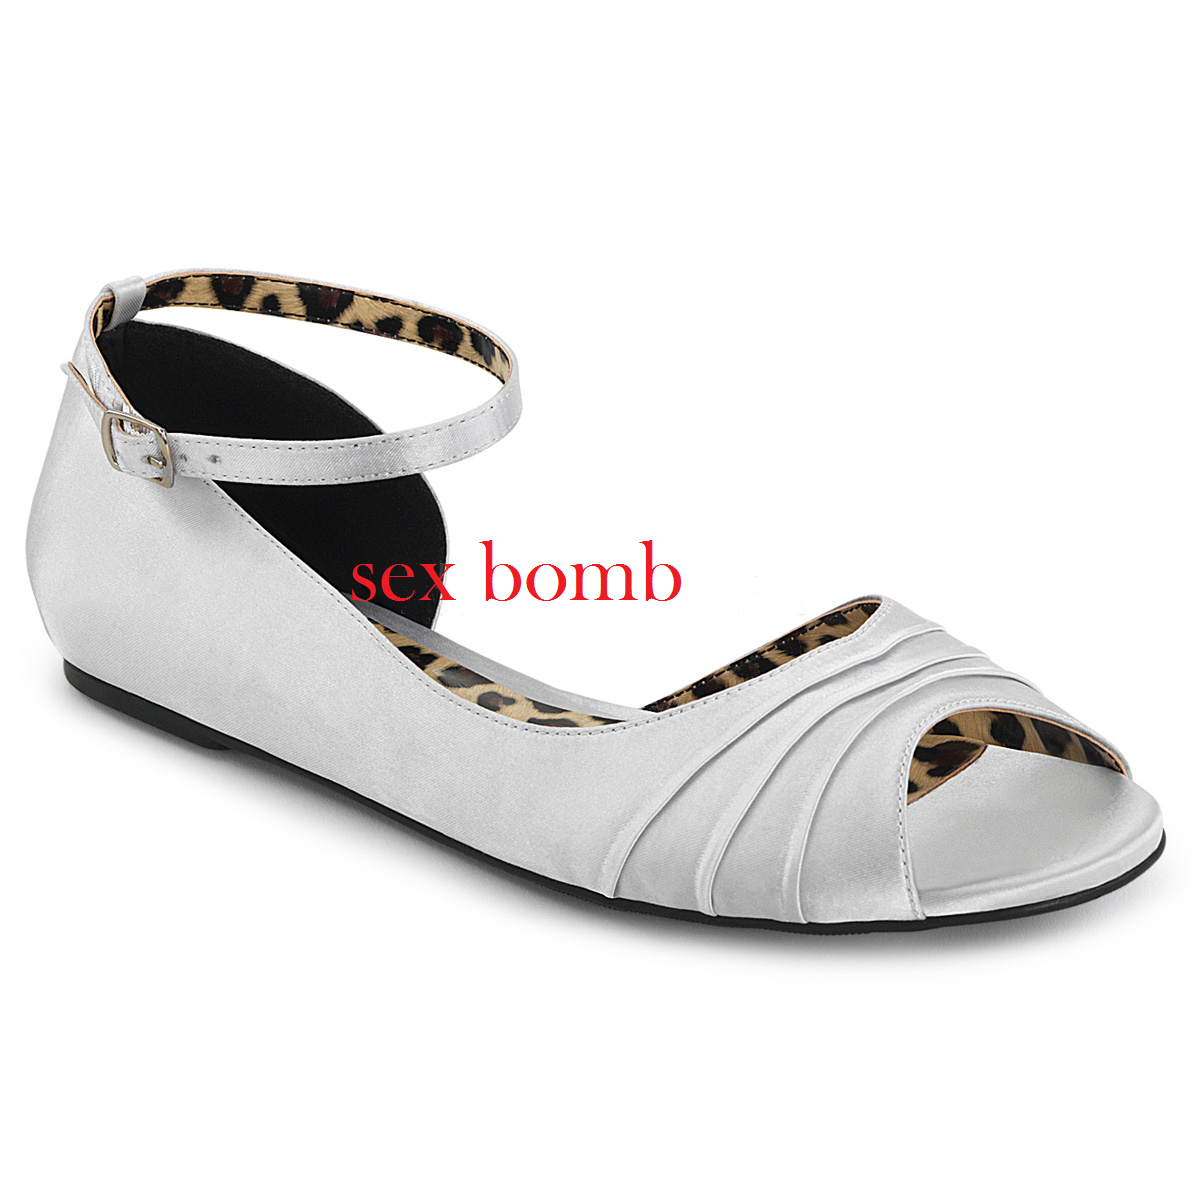 Sexy BALLERINE APERTE dal 39 al ARGENTO 46 ARGENTO al cinturino tacco flat scarpe GLAMOUR 85cfd2